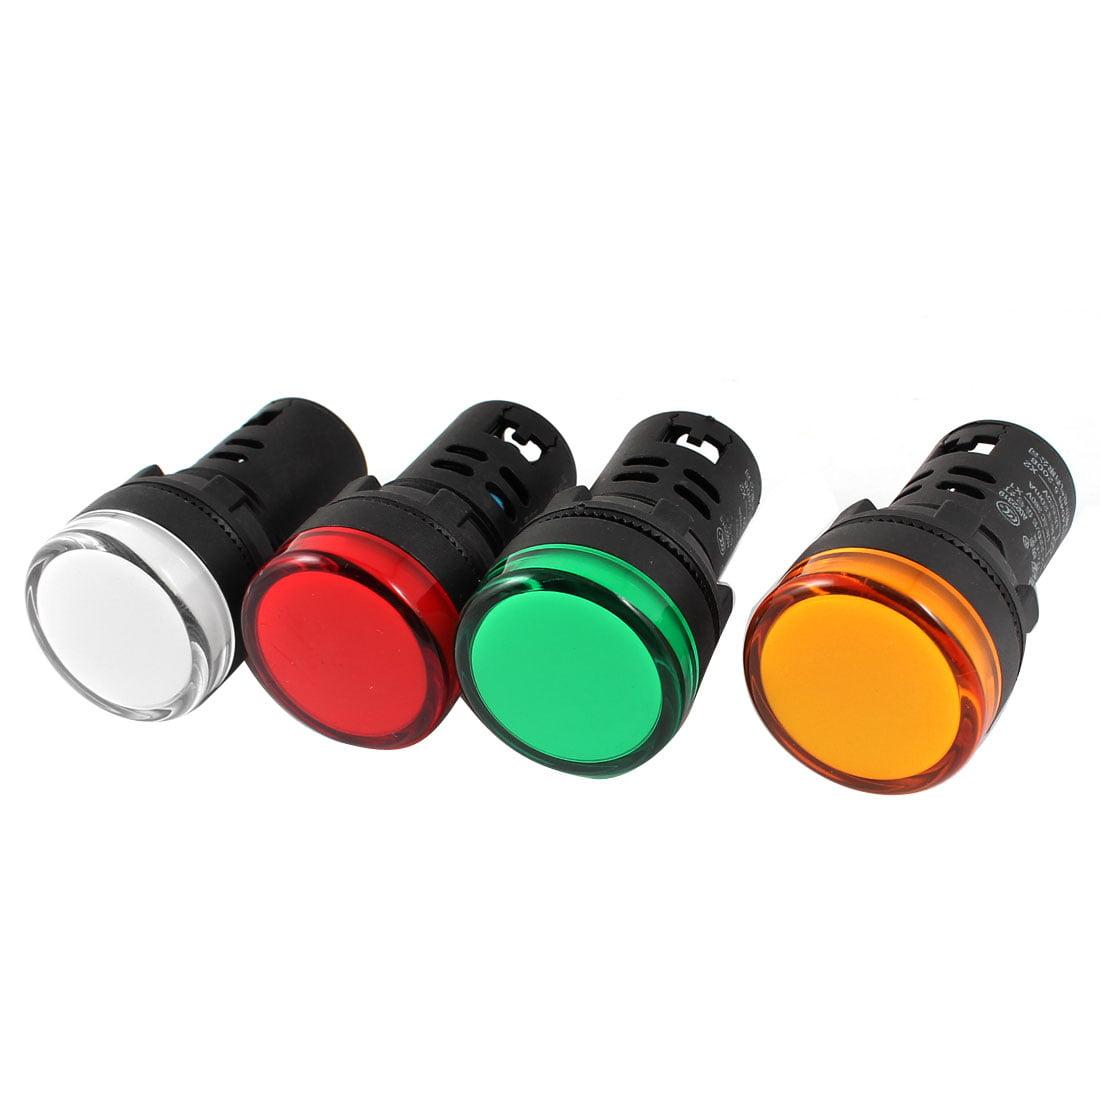 Unique Bargains 4 x Plastic Housing  Power Indicator Pilot Signal Light Lamp AC380V